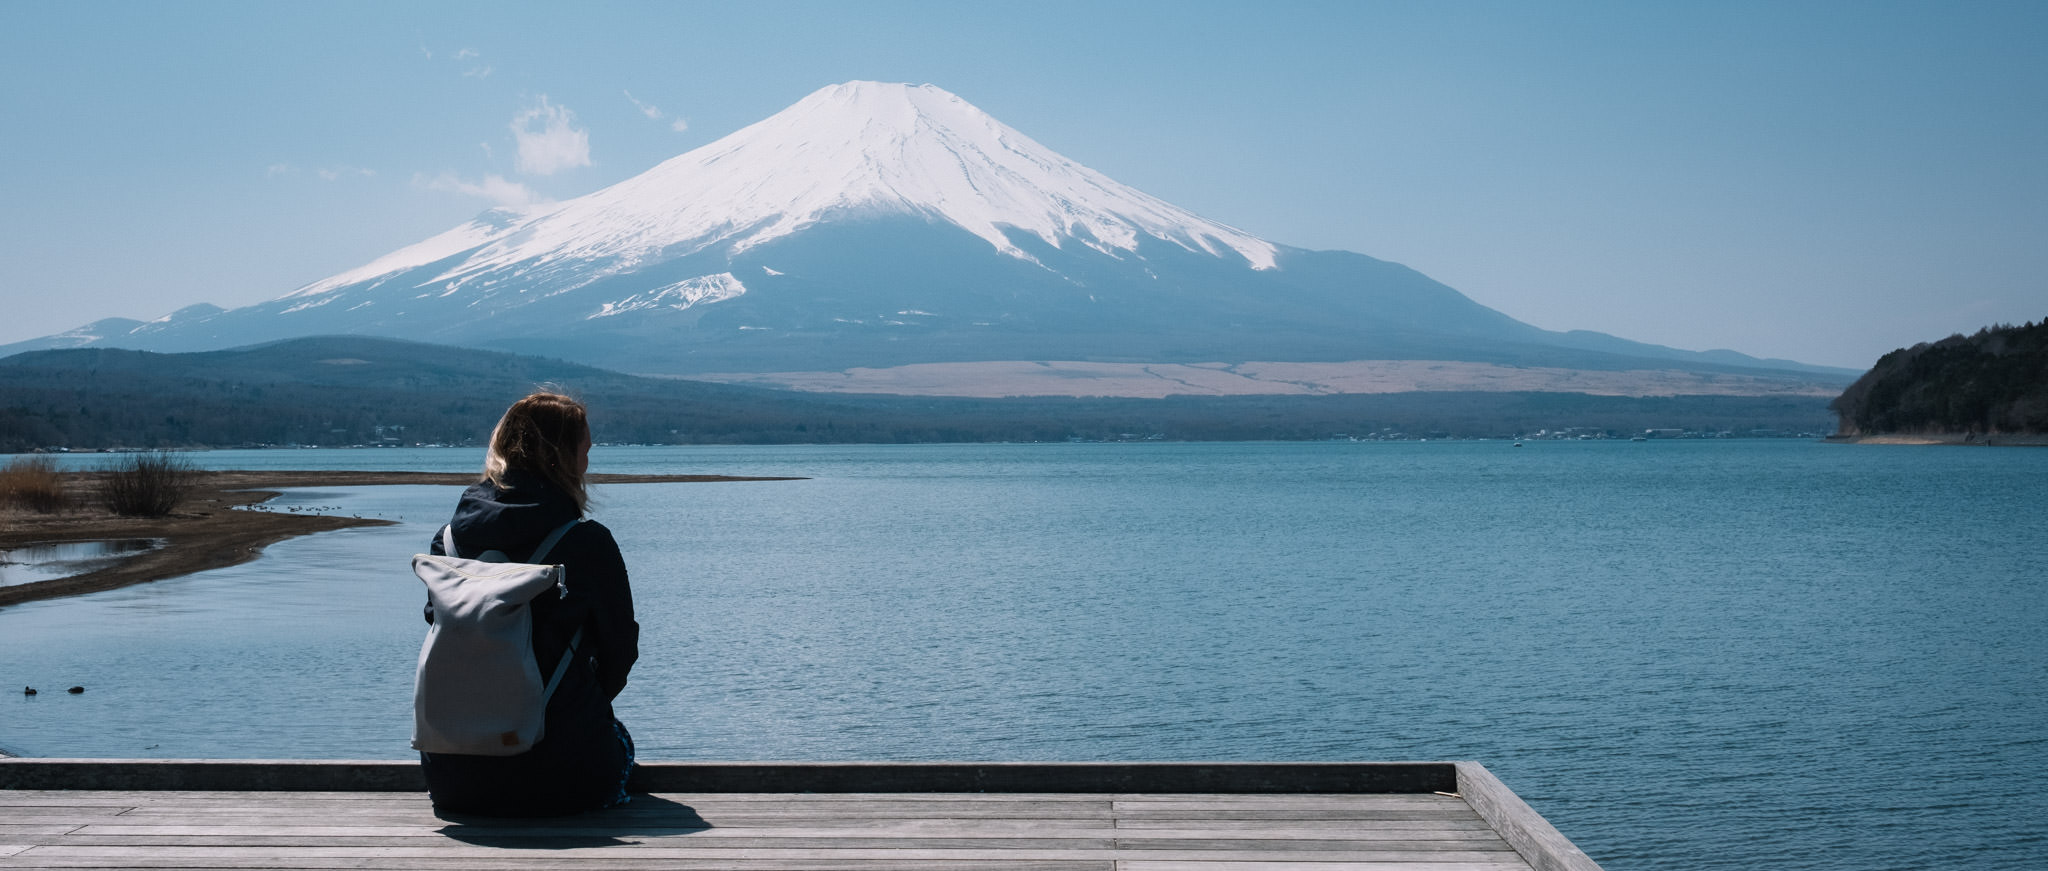 chris_eberhardt_japan_travel_reise_nippon-71.jpg